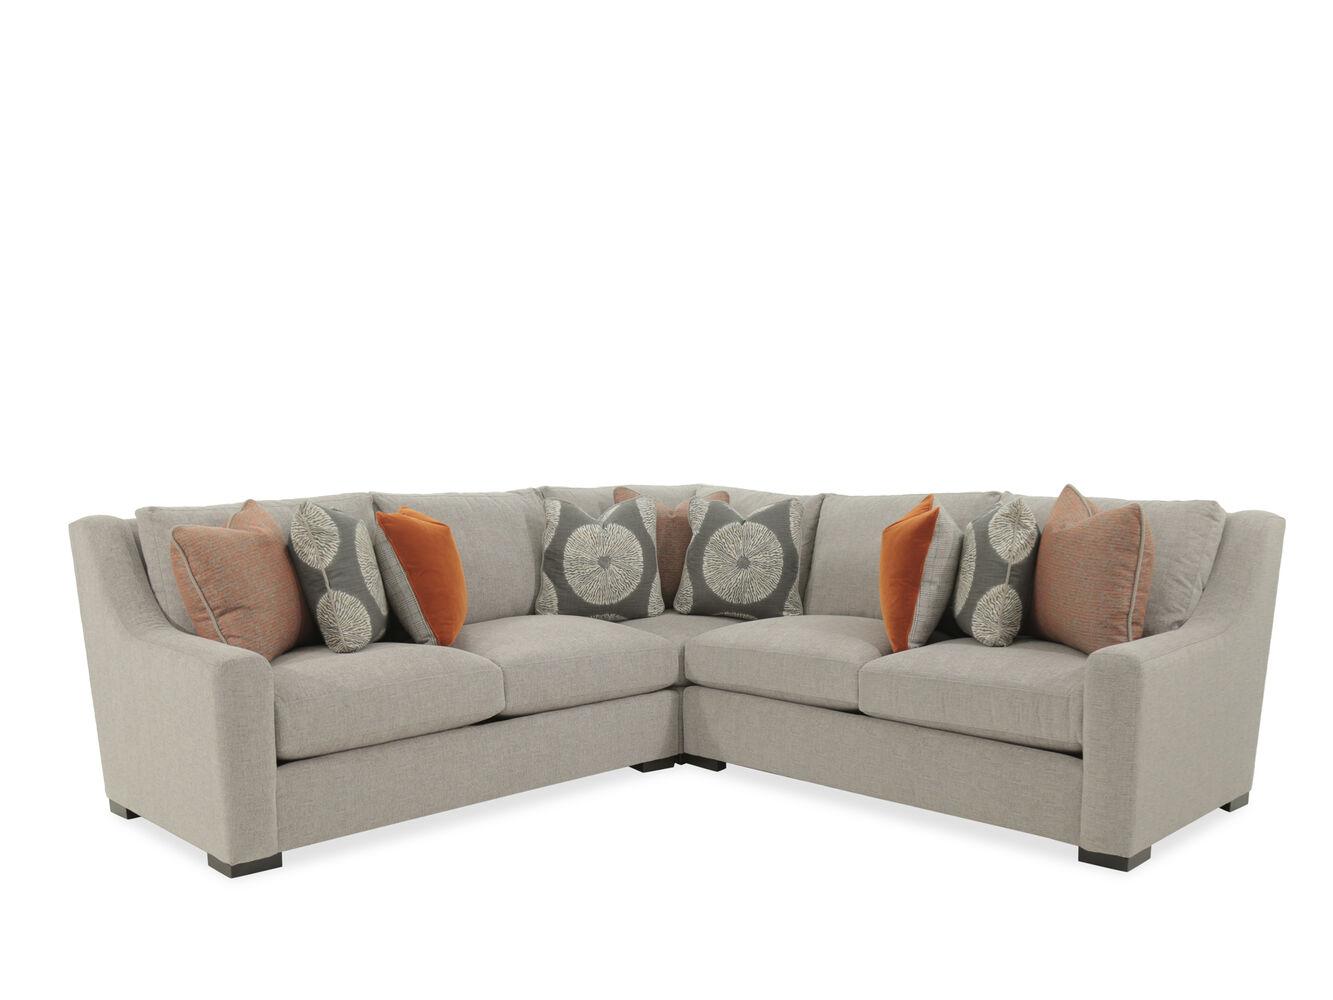 Bernhardt Germain Three-Piece Sectional Sofa | Mathis ...